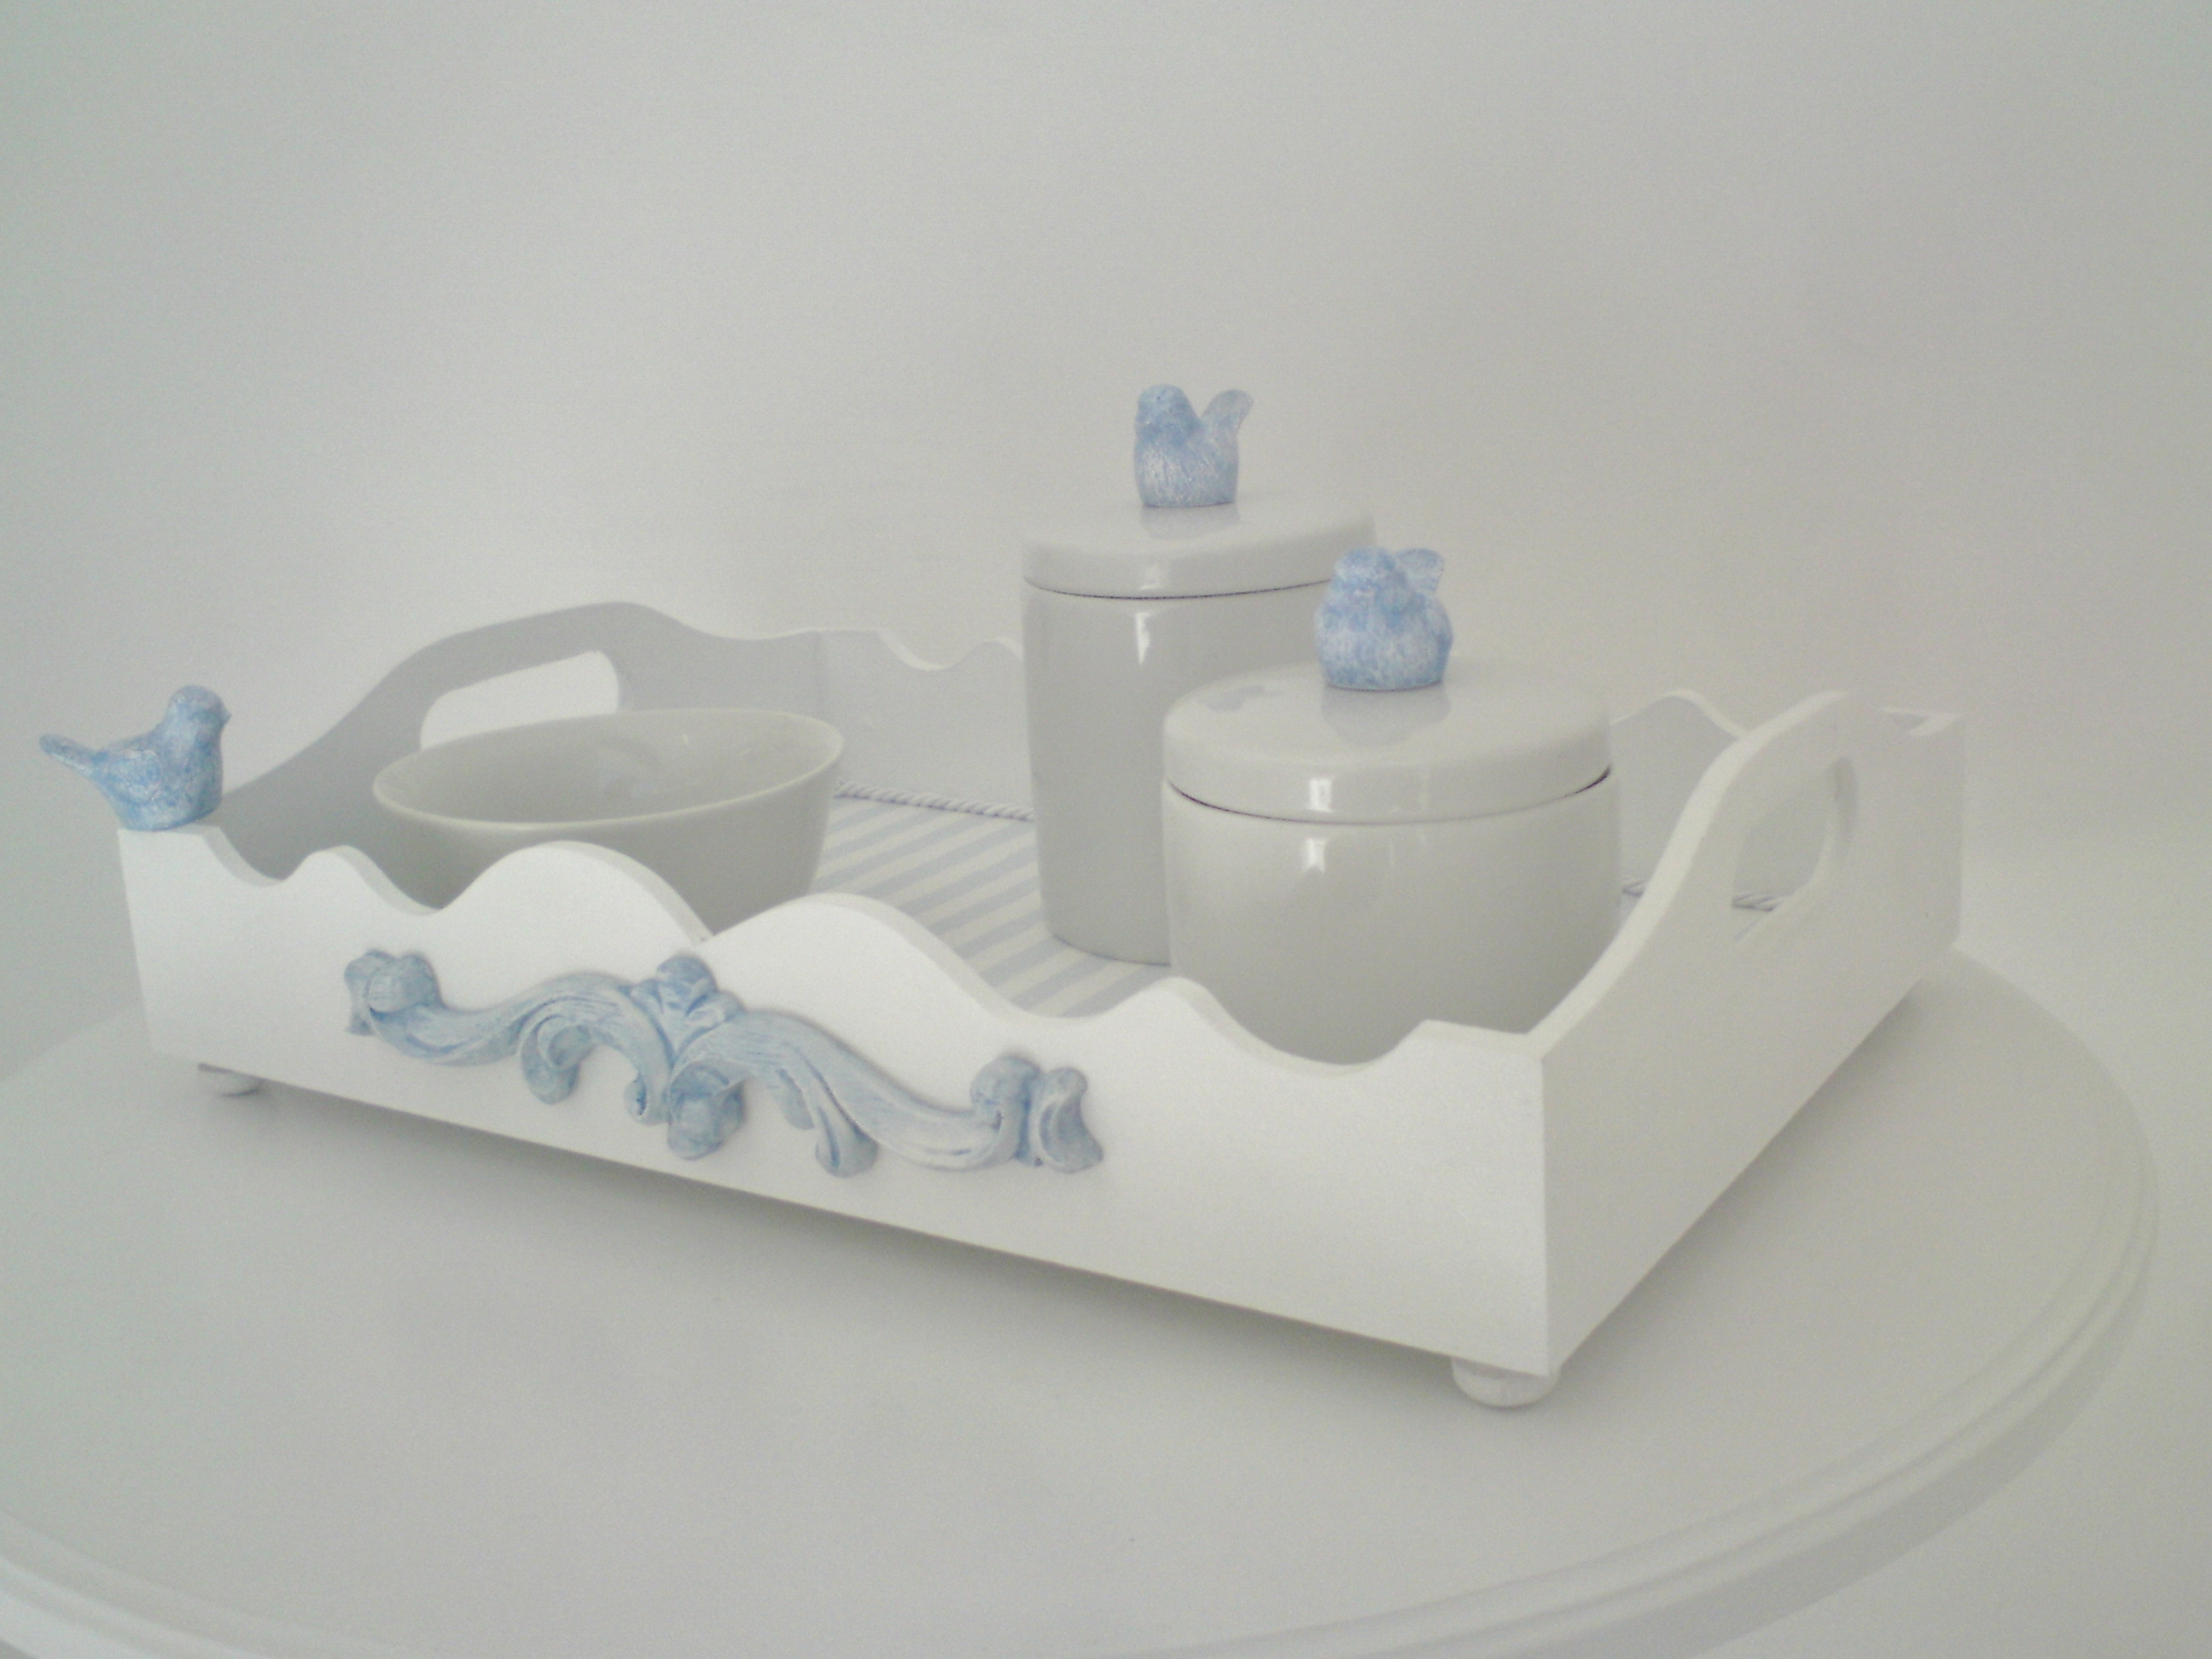 kit higiene porcelana kit higiene porcelana #596772 2592 1944